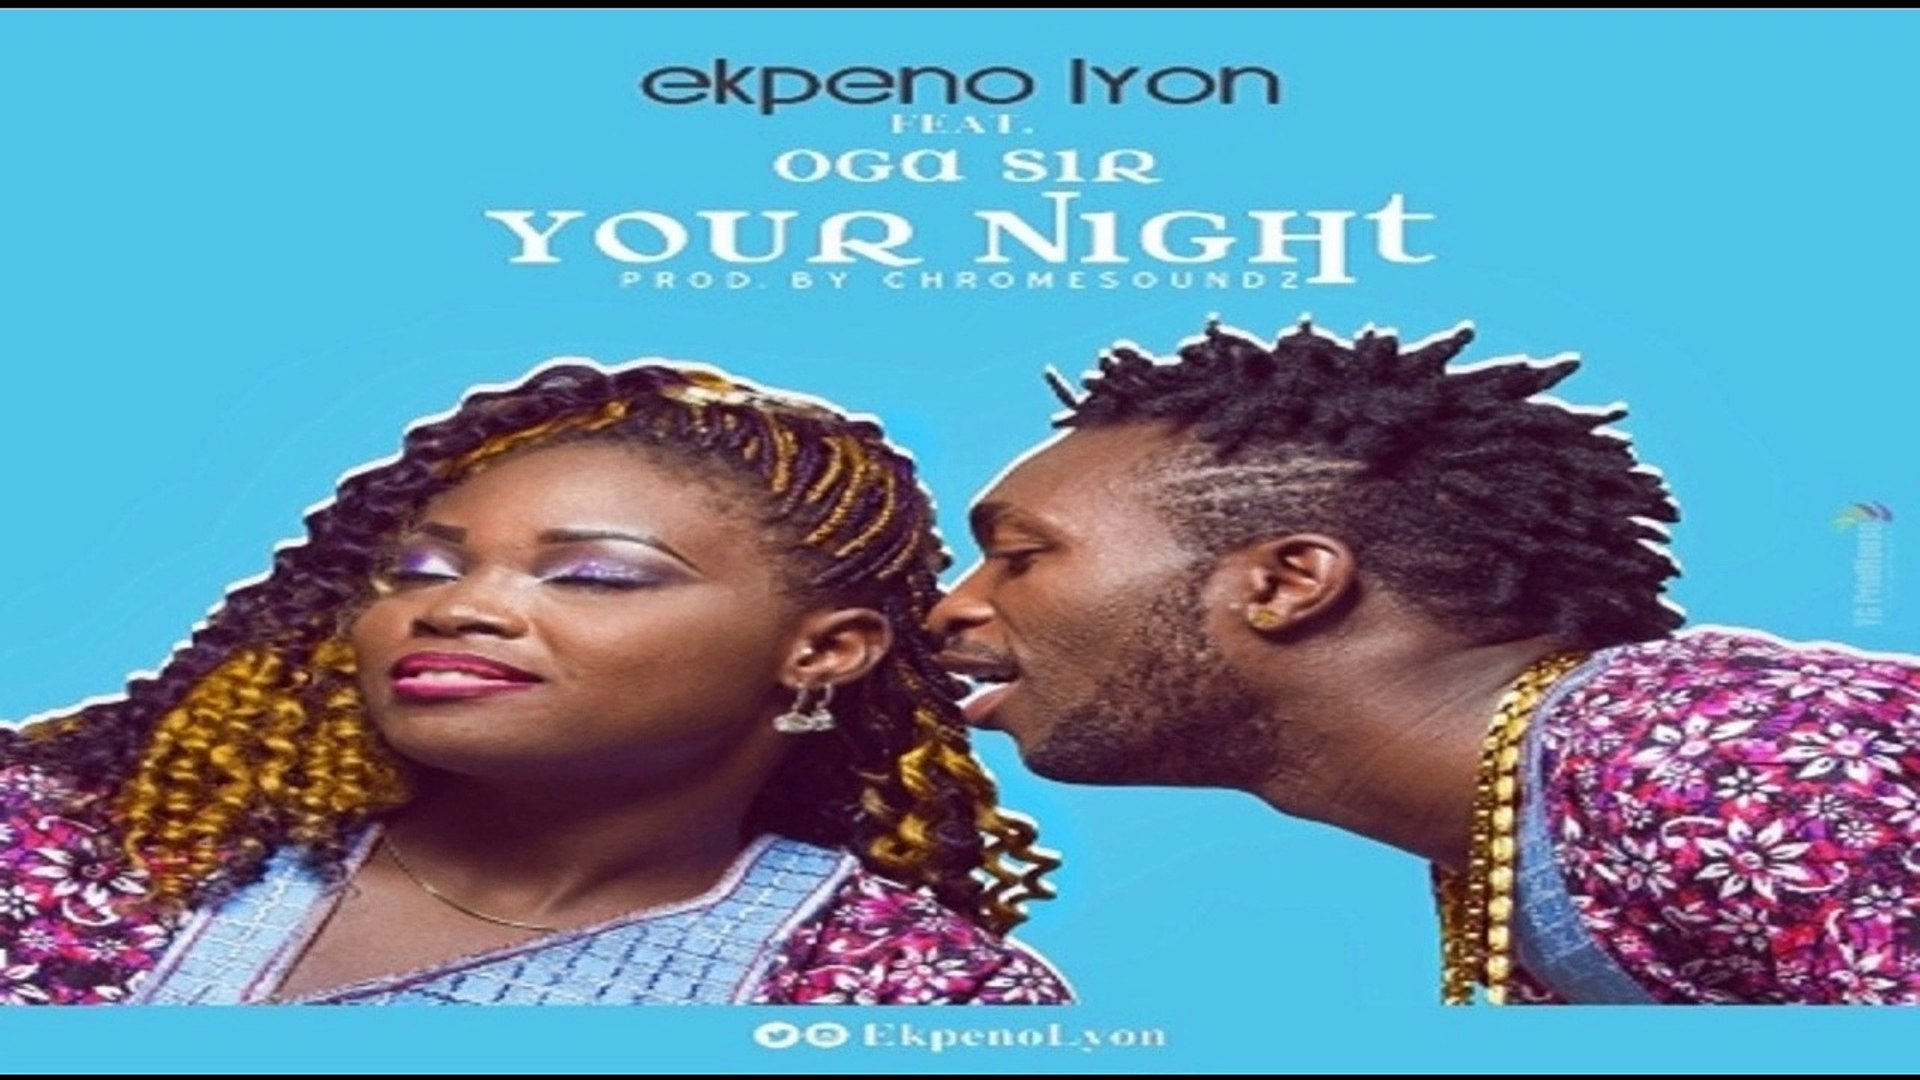 Ekpeno Lyon ft. Oga Sir – Your Night (NEW MUSIC 2016)